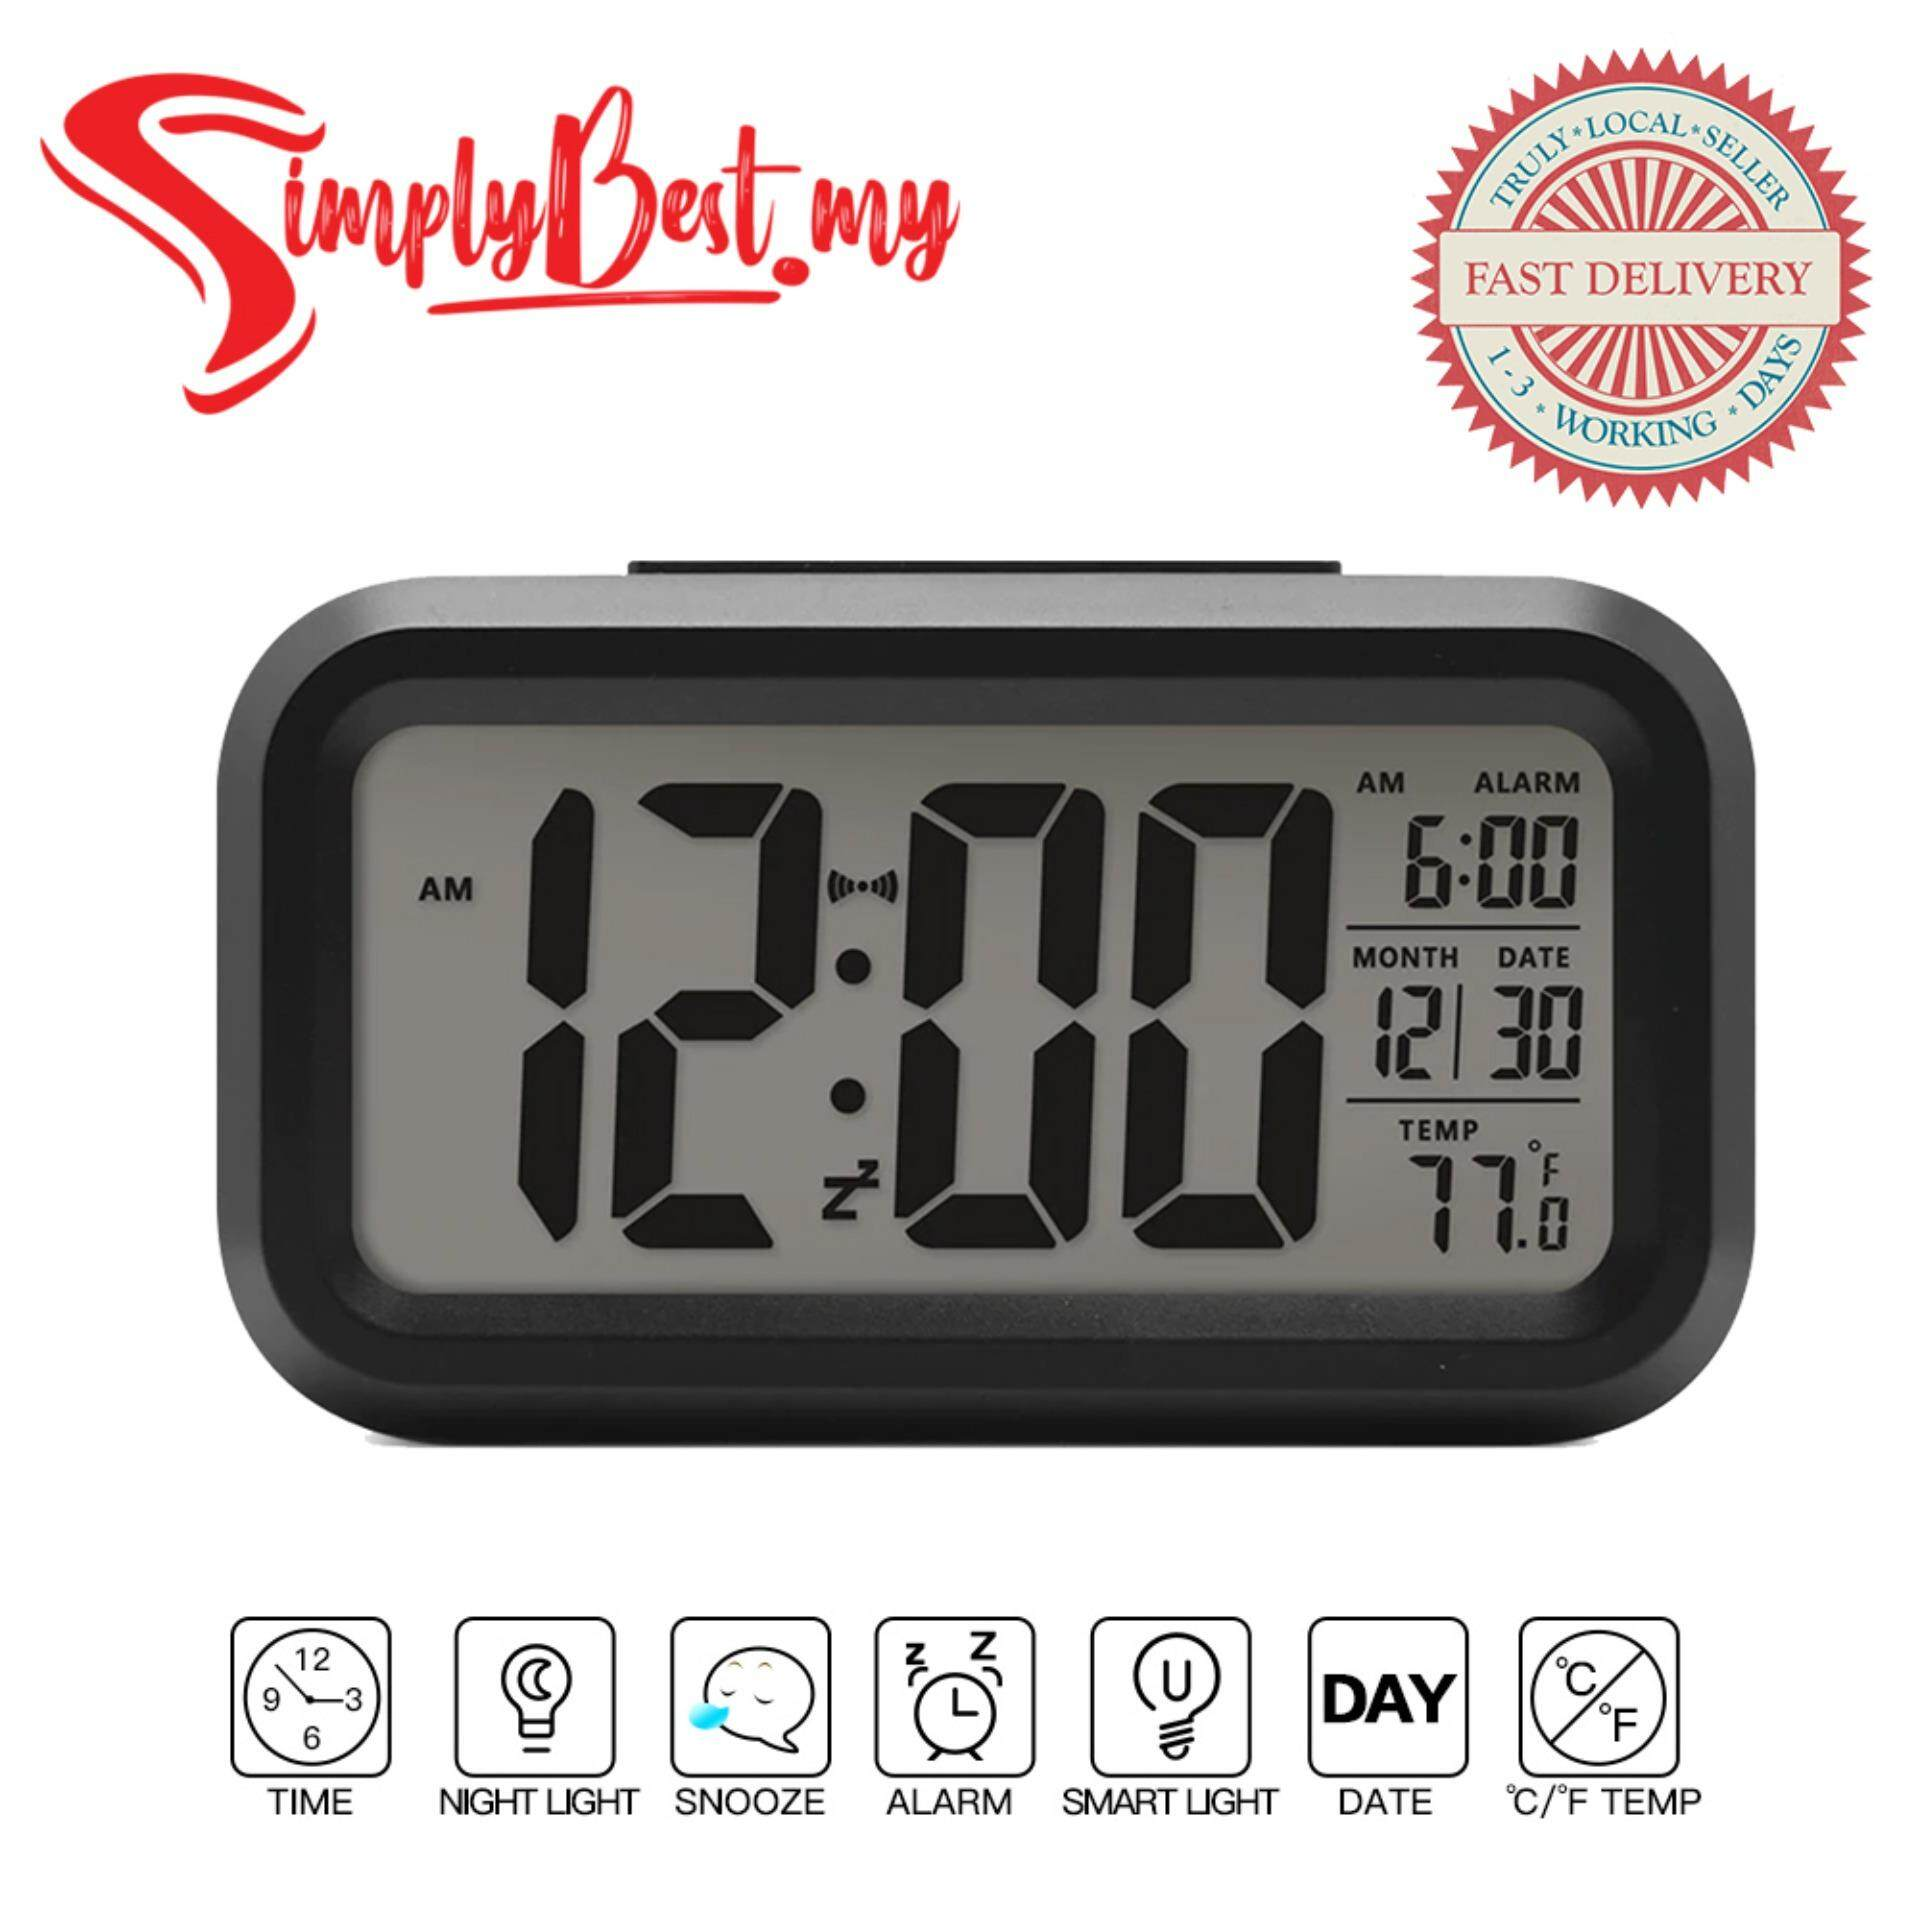 WD SQUARE CHECKS CLOCK 12 AND 18 wooden clock with checks design